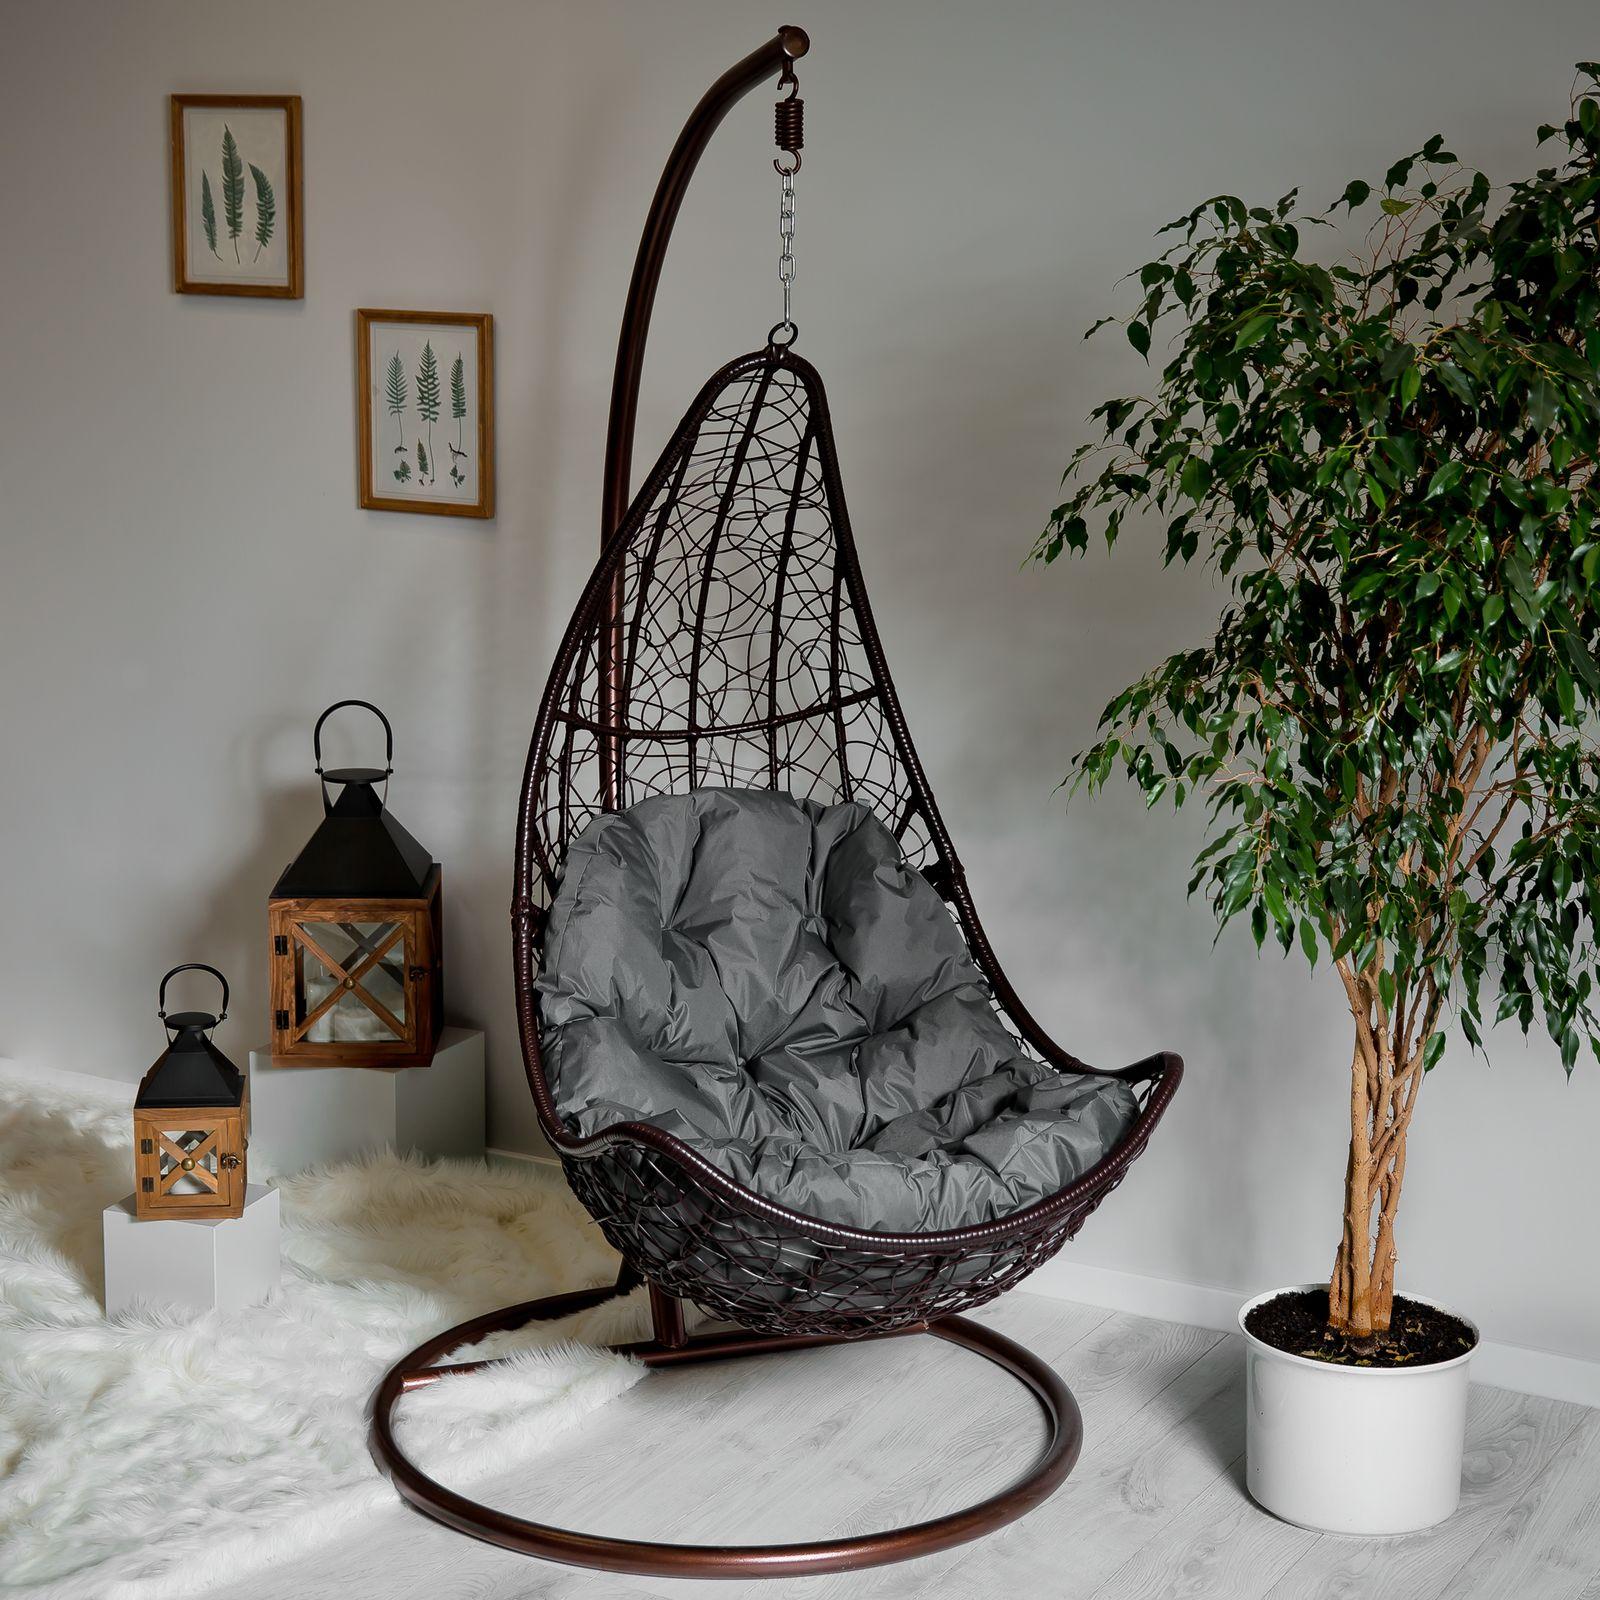 Cojín trapezoidal para silla colgante D031-26CW 144 x 90/64 x 10/12 cm PATIO